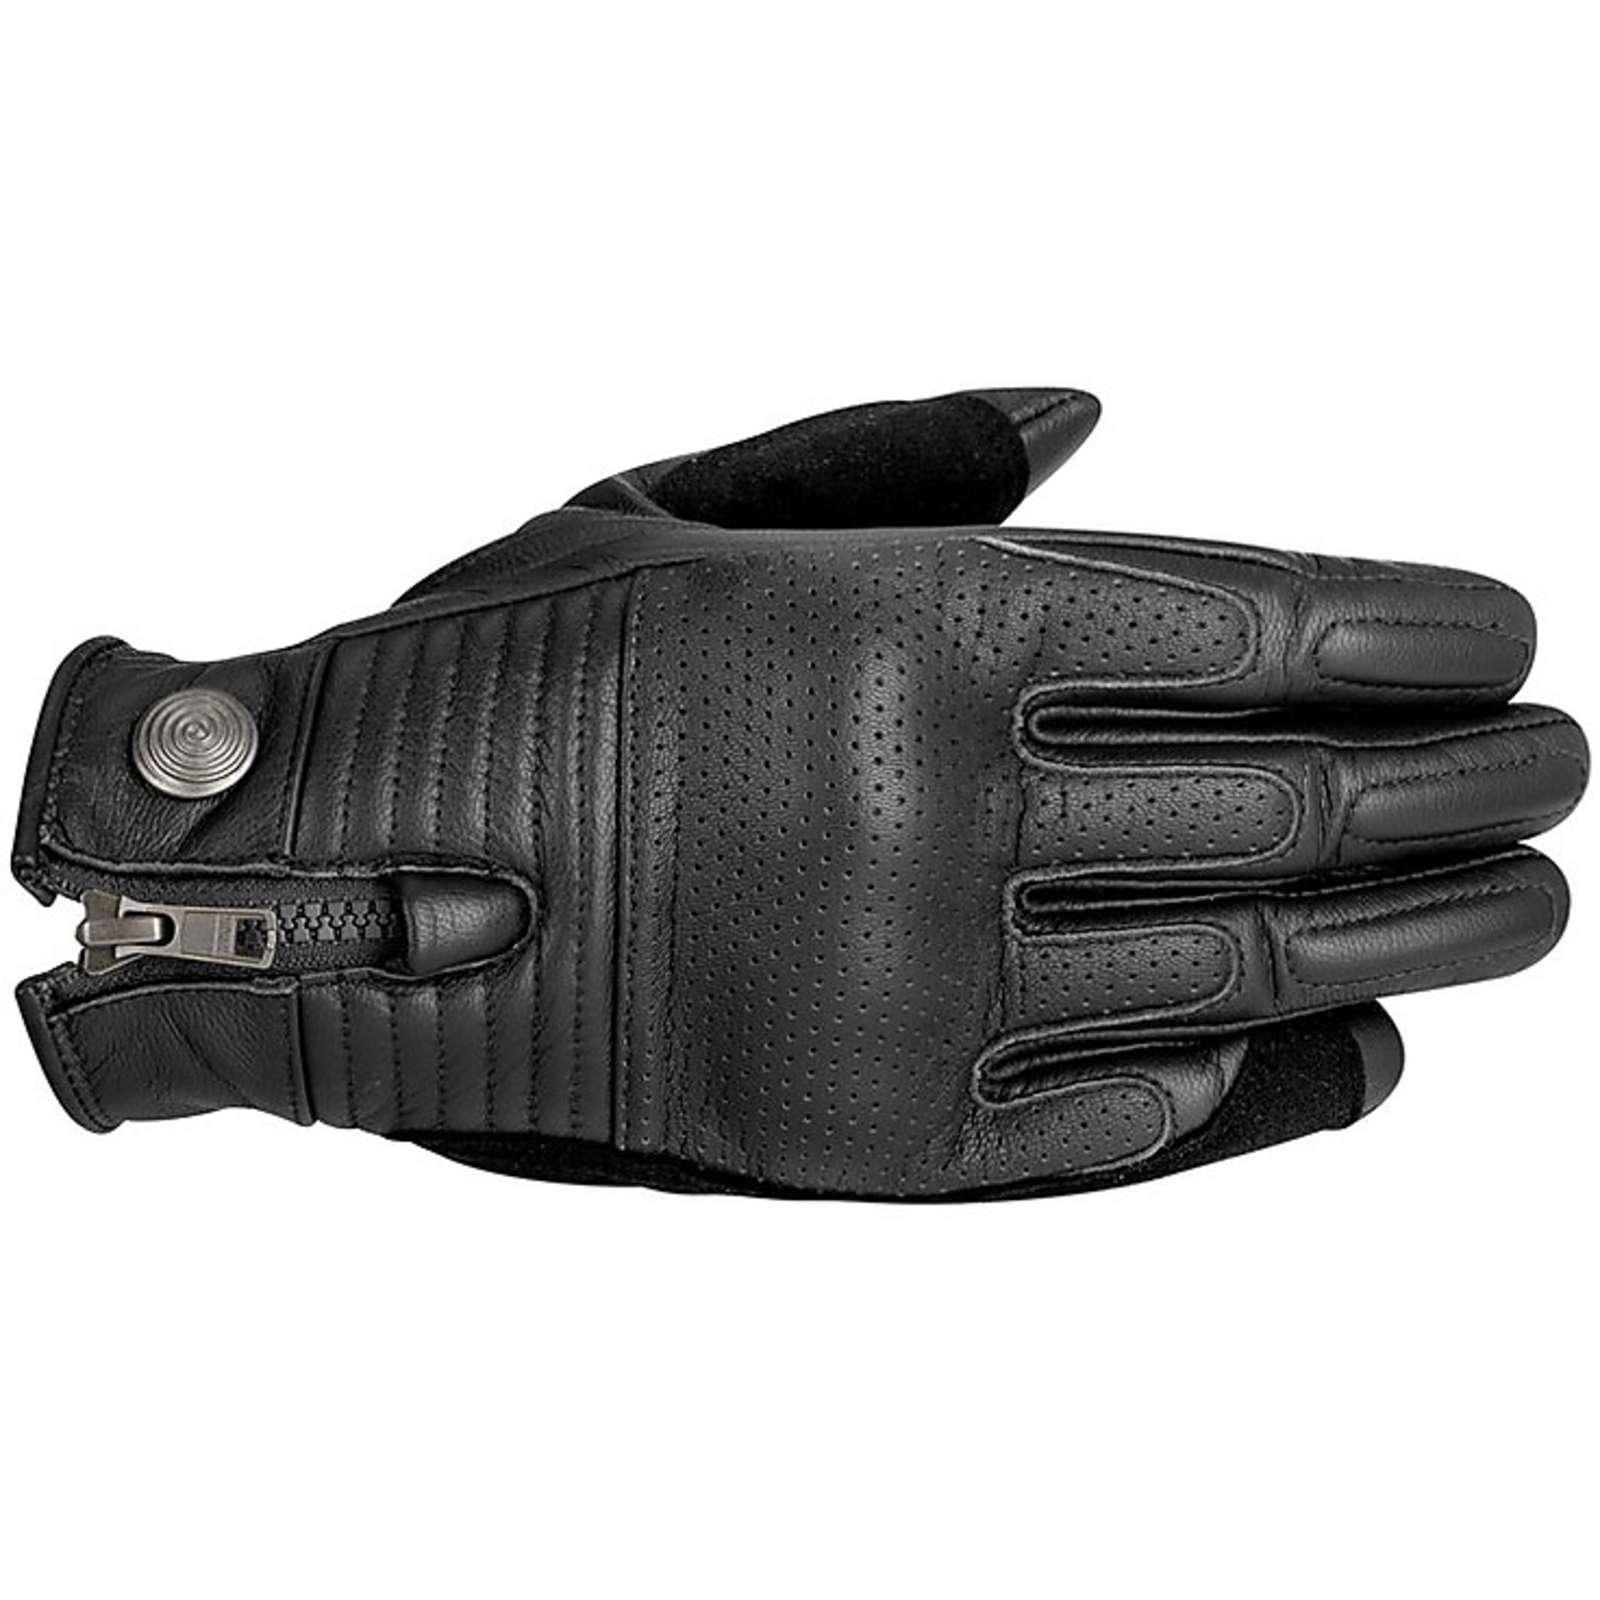 GUANTI MOTO ALPINESTARS RAYBURN LEATHER GLOVE BLACK COD. 3508315